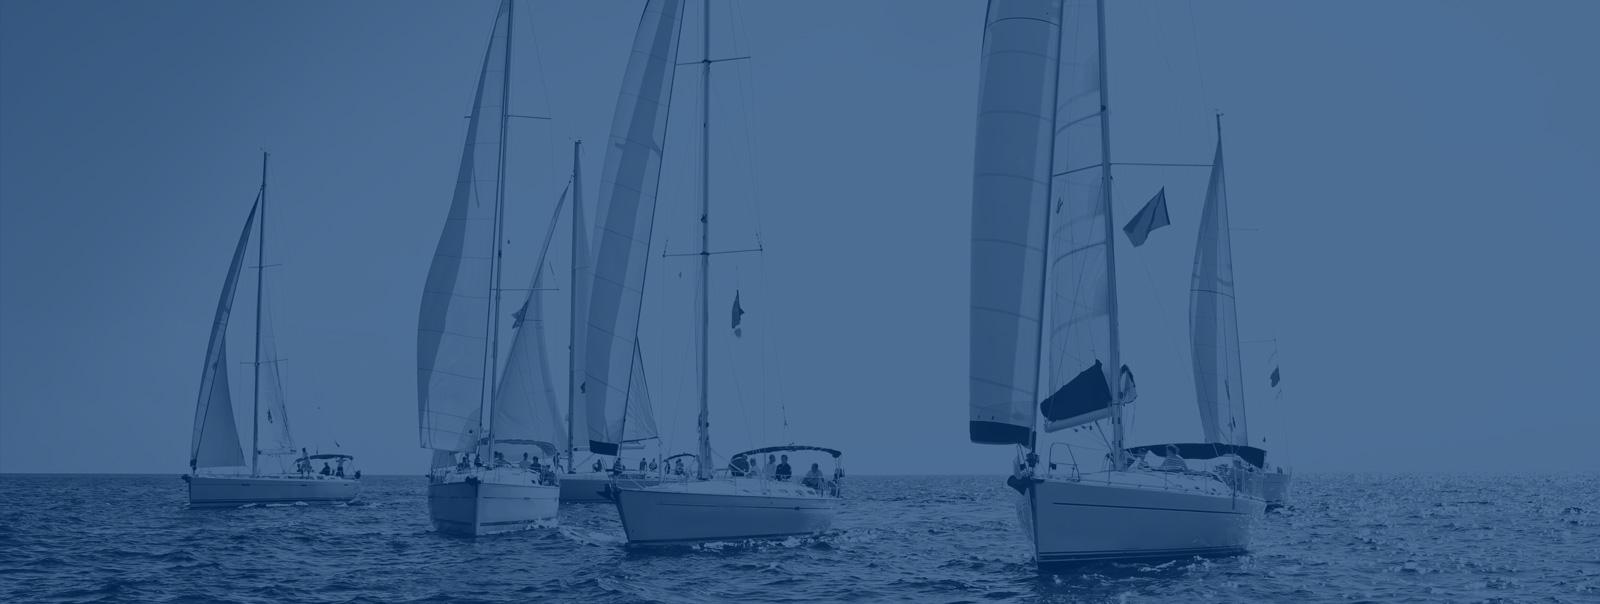 head-sails-used-sails-devon